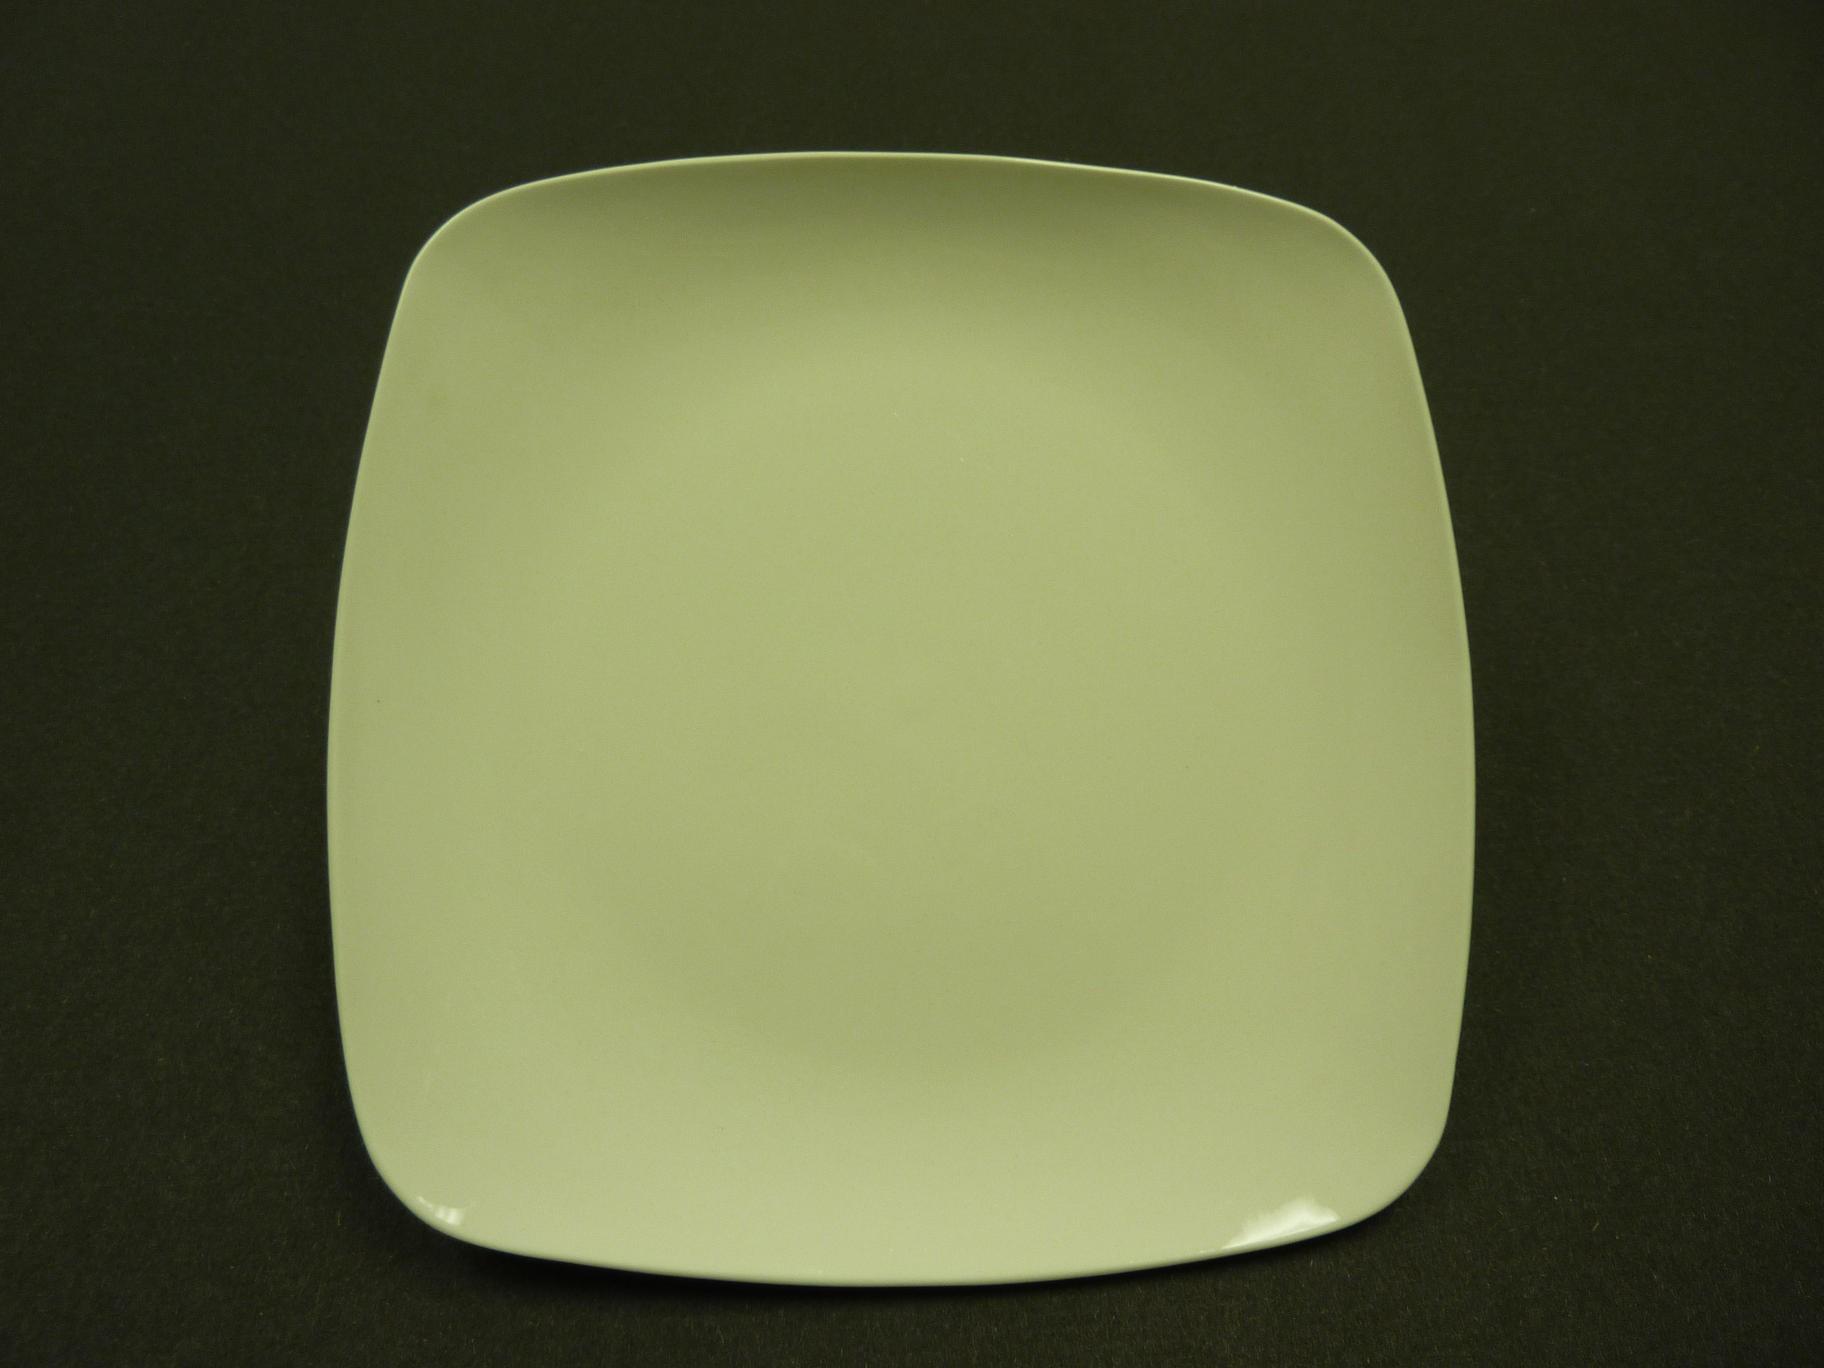 "Yanco fu-308 Fuji 8"" Rounded Square Flat Plate"